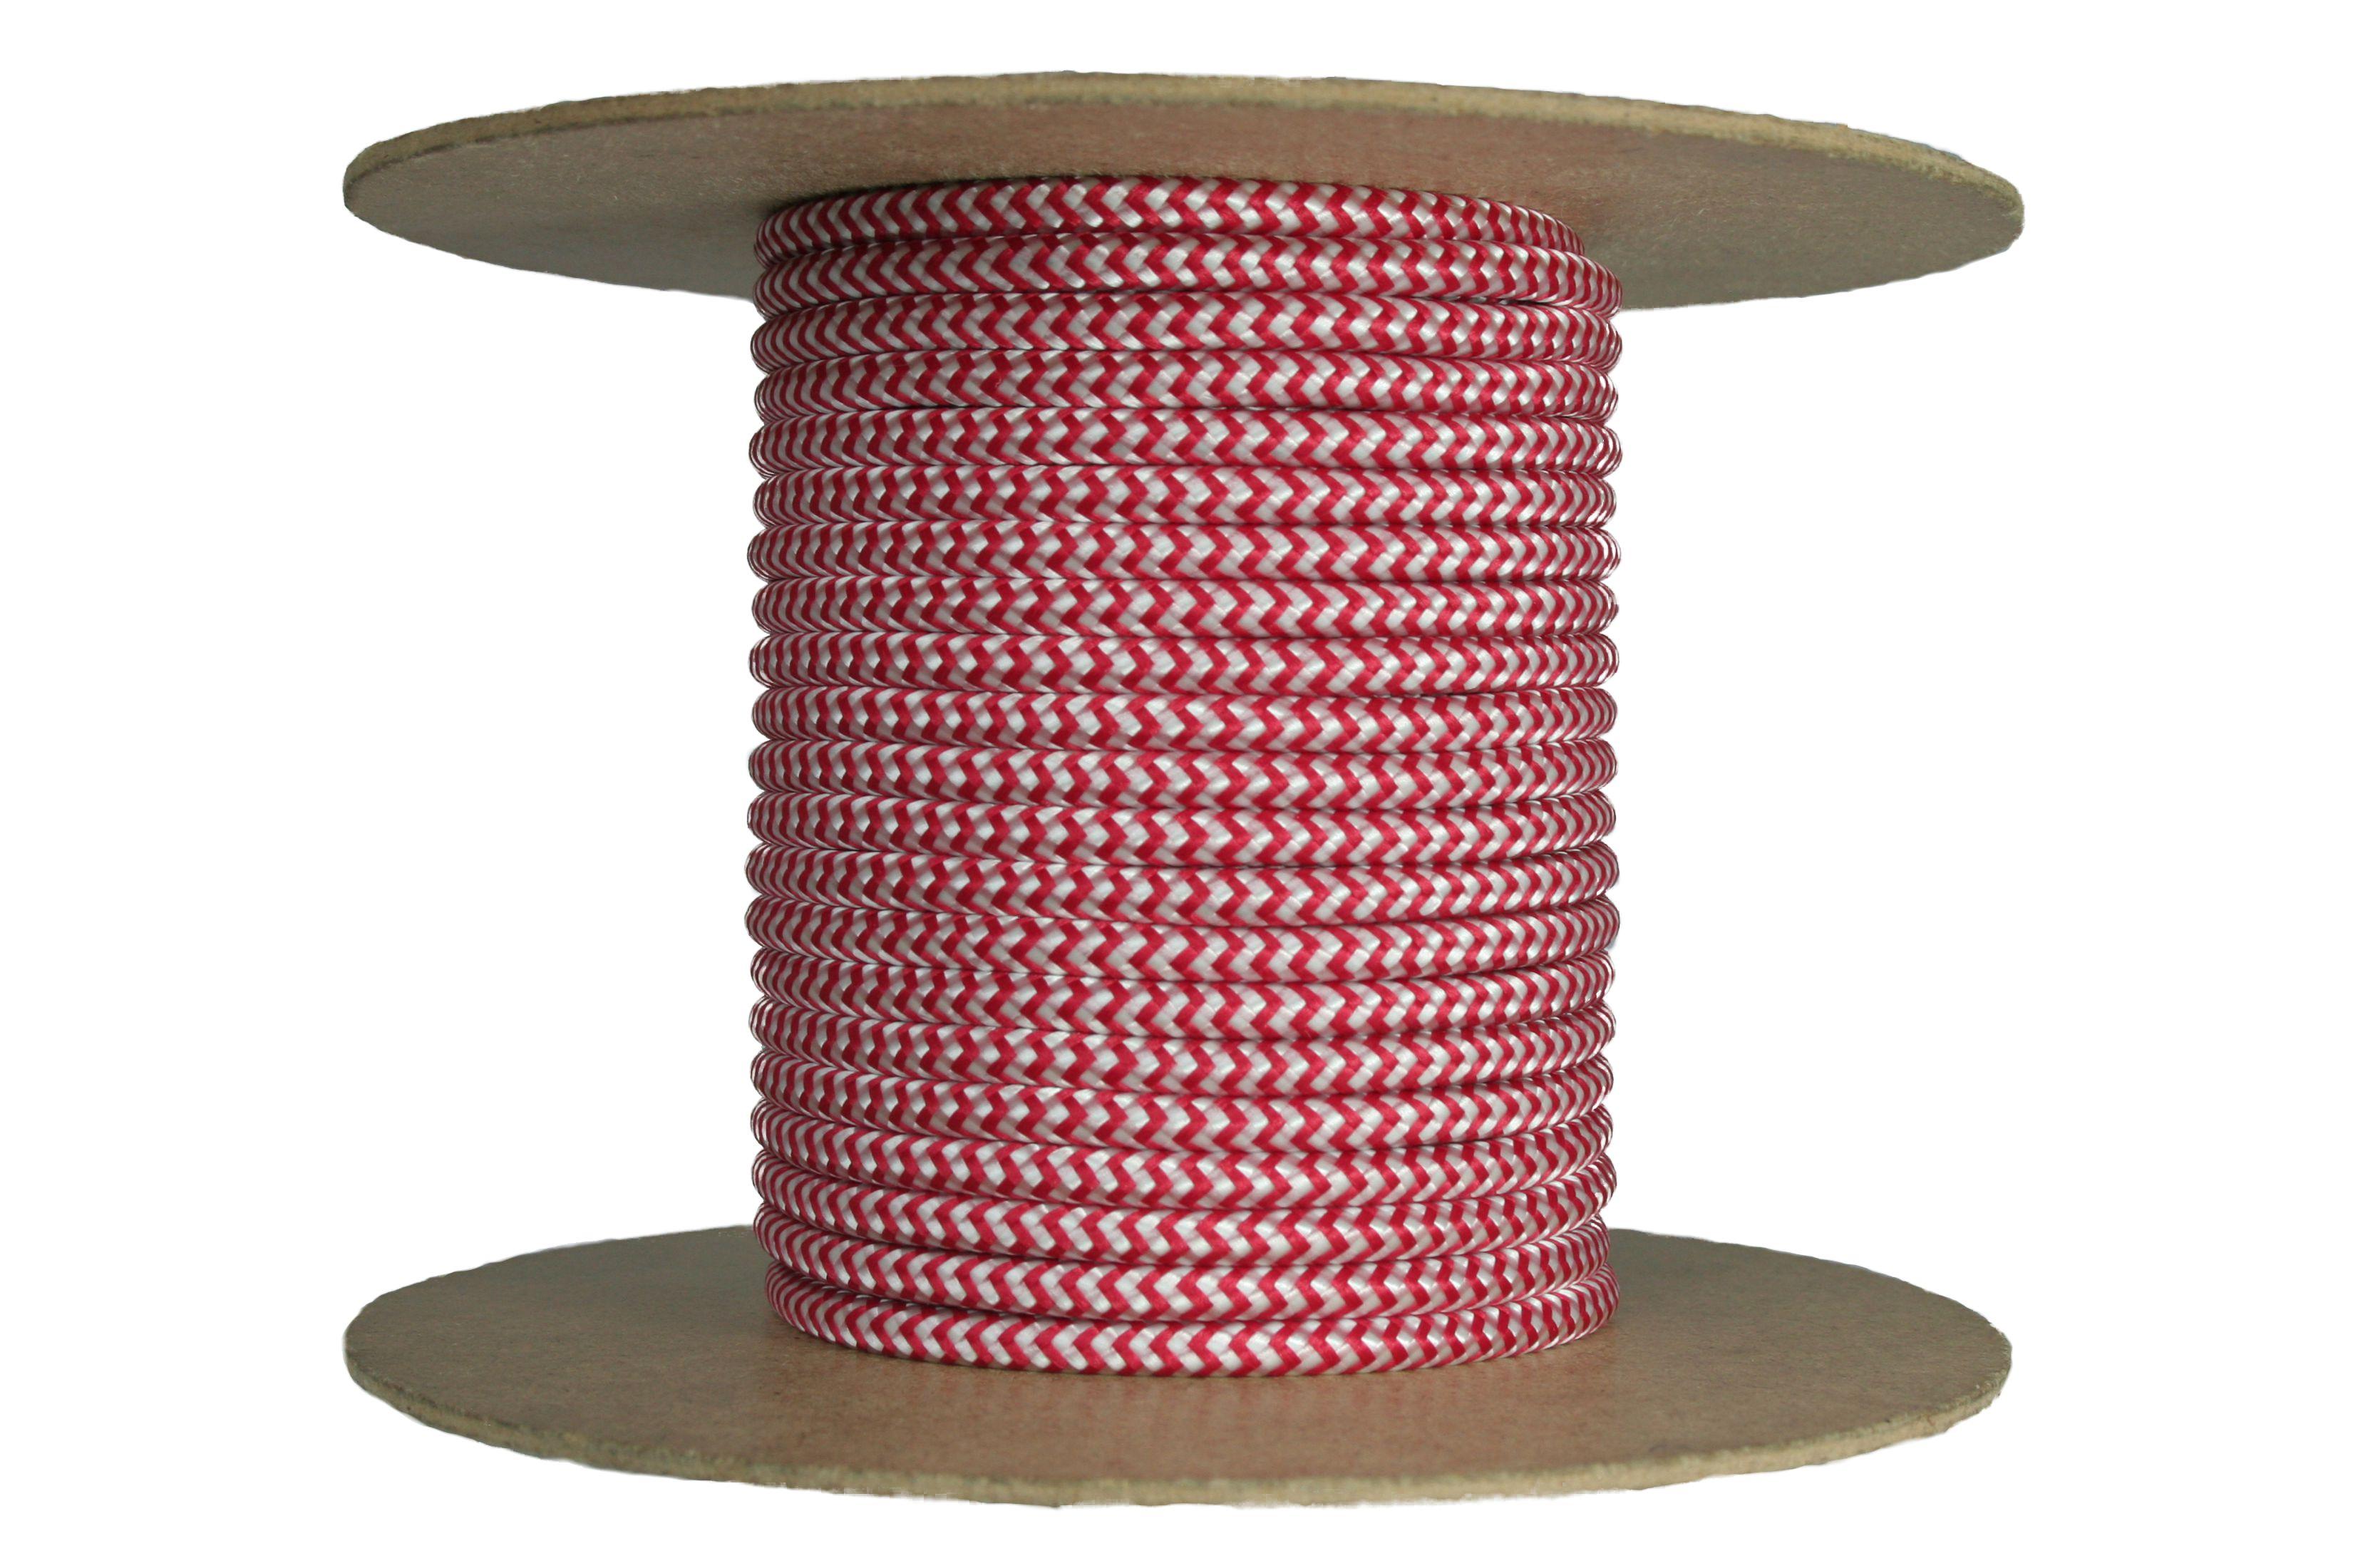 Oplot na kablach JD0103